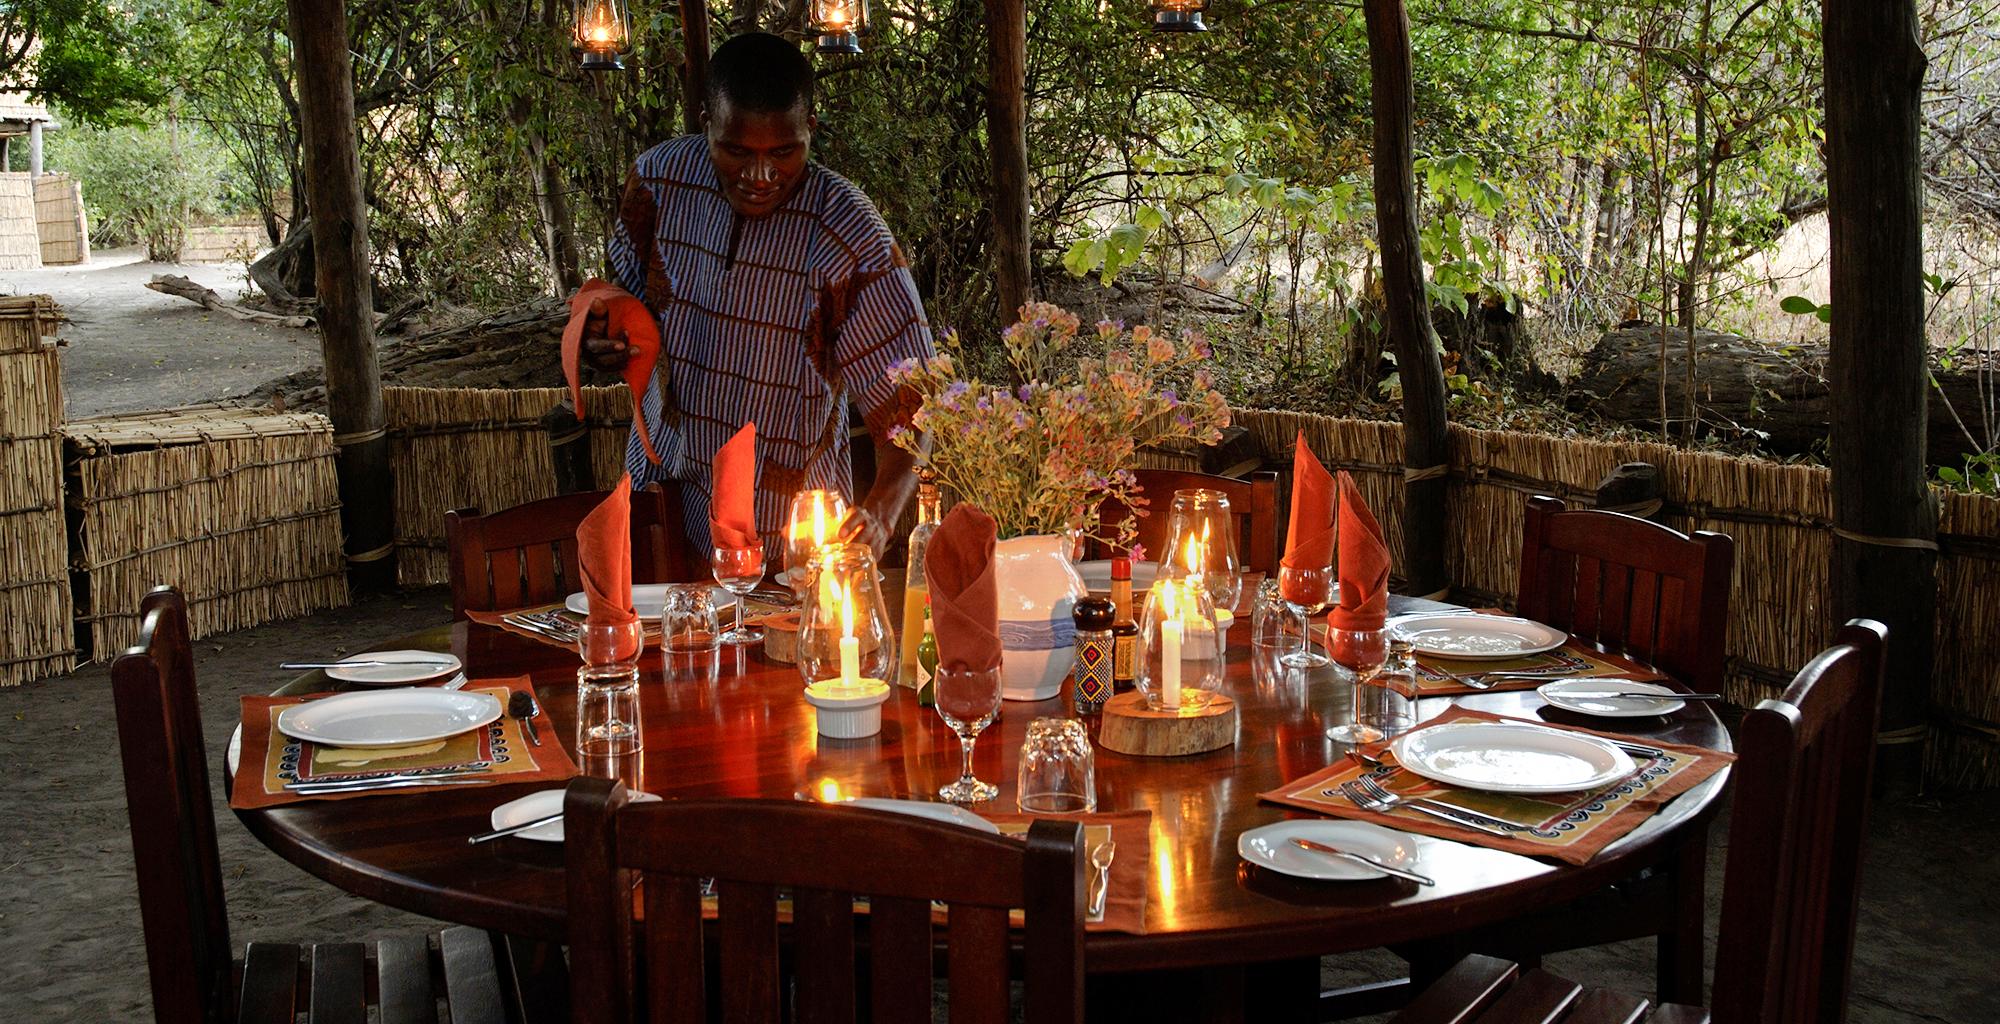 Zambia-Chikoko-Trails-Dining